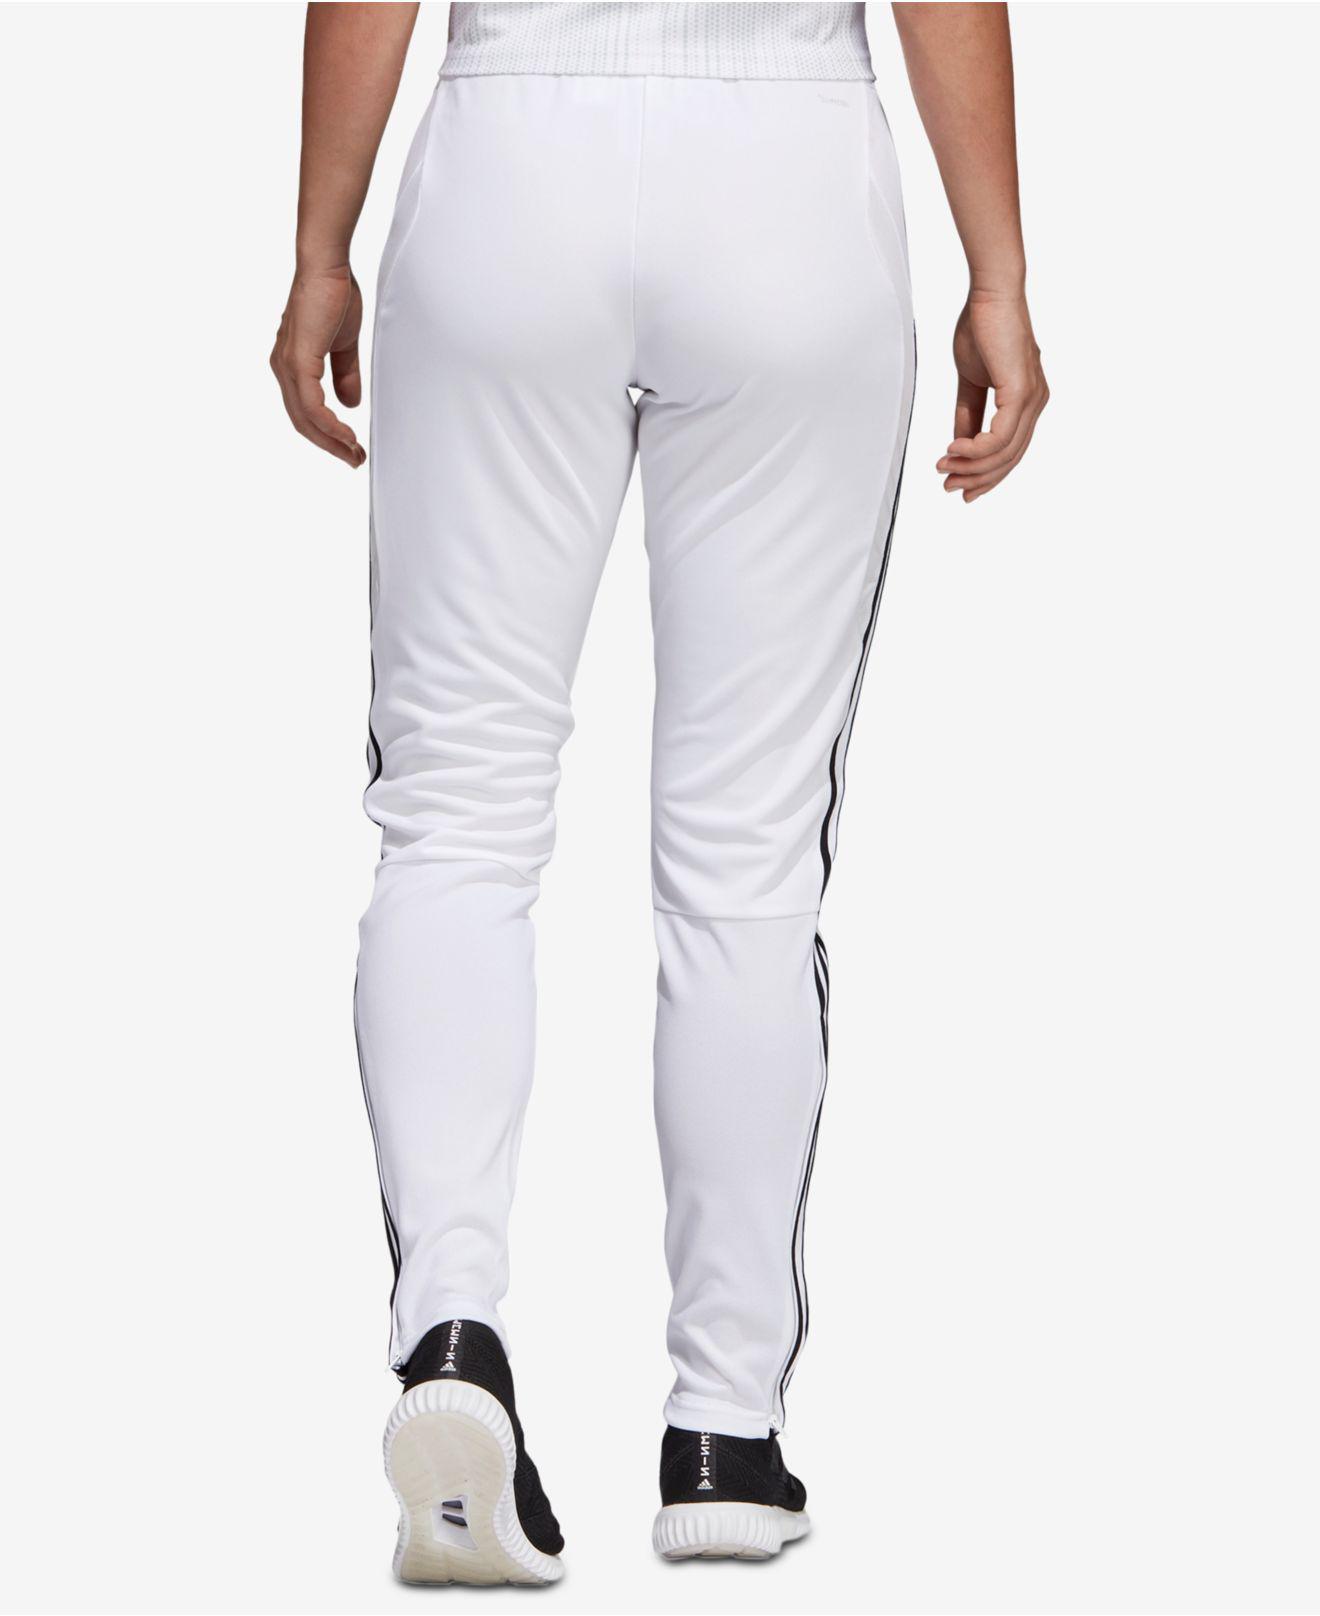 the latest d00ed 3840f Women's White Tiro Climacool® Soccer Pants